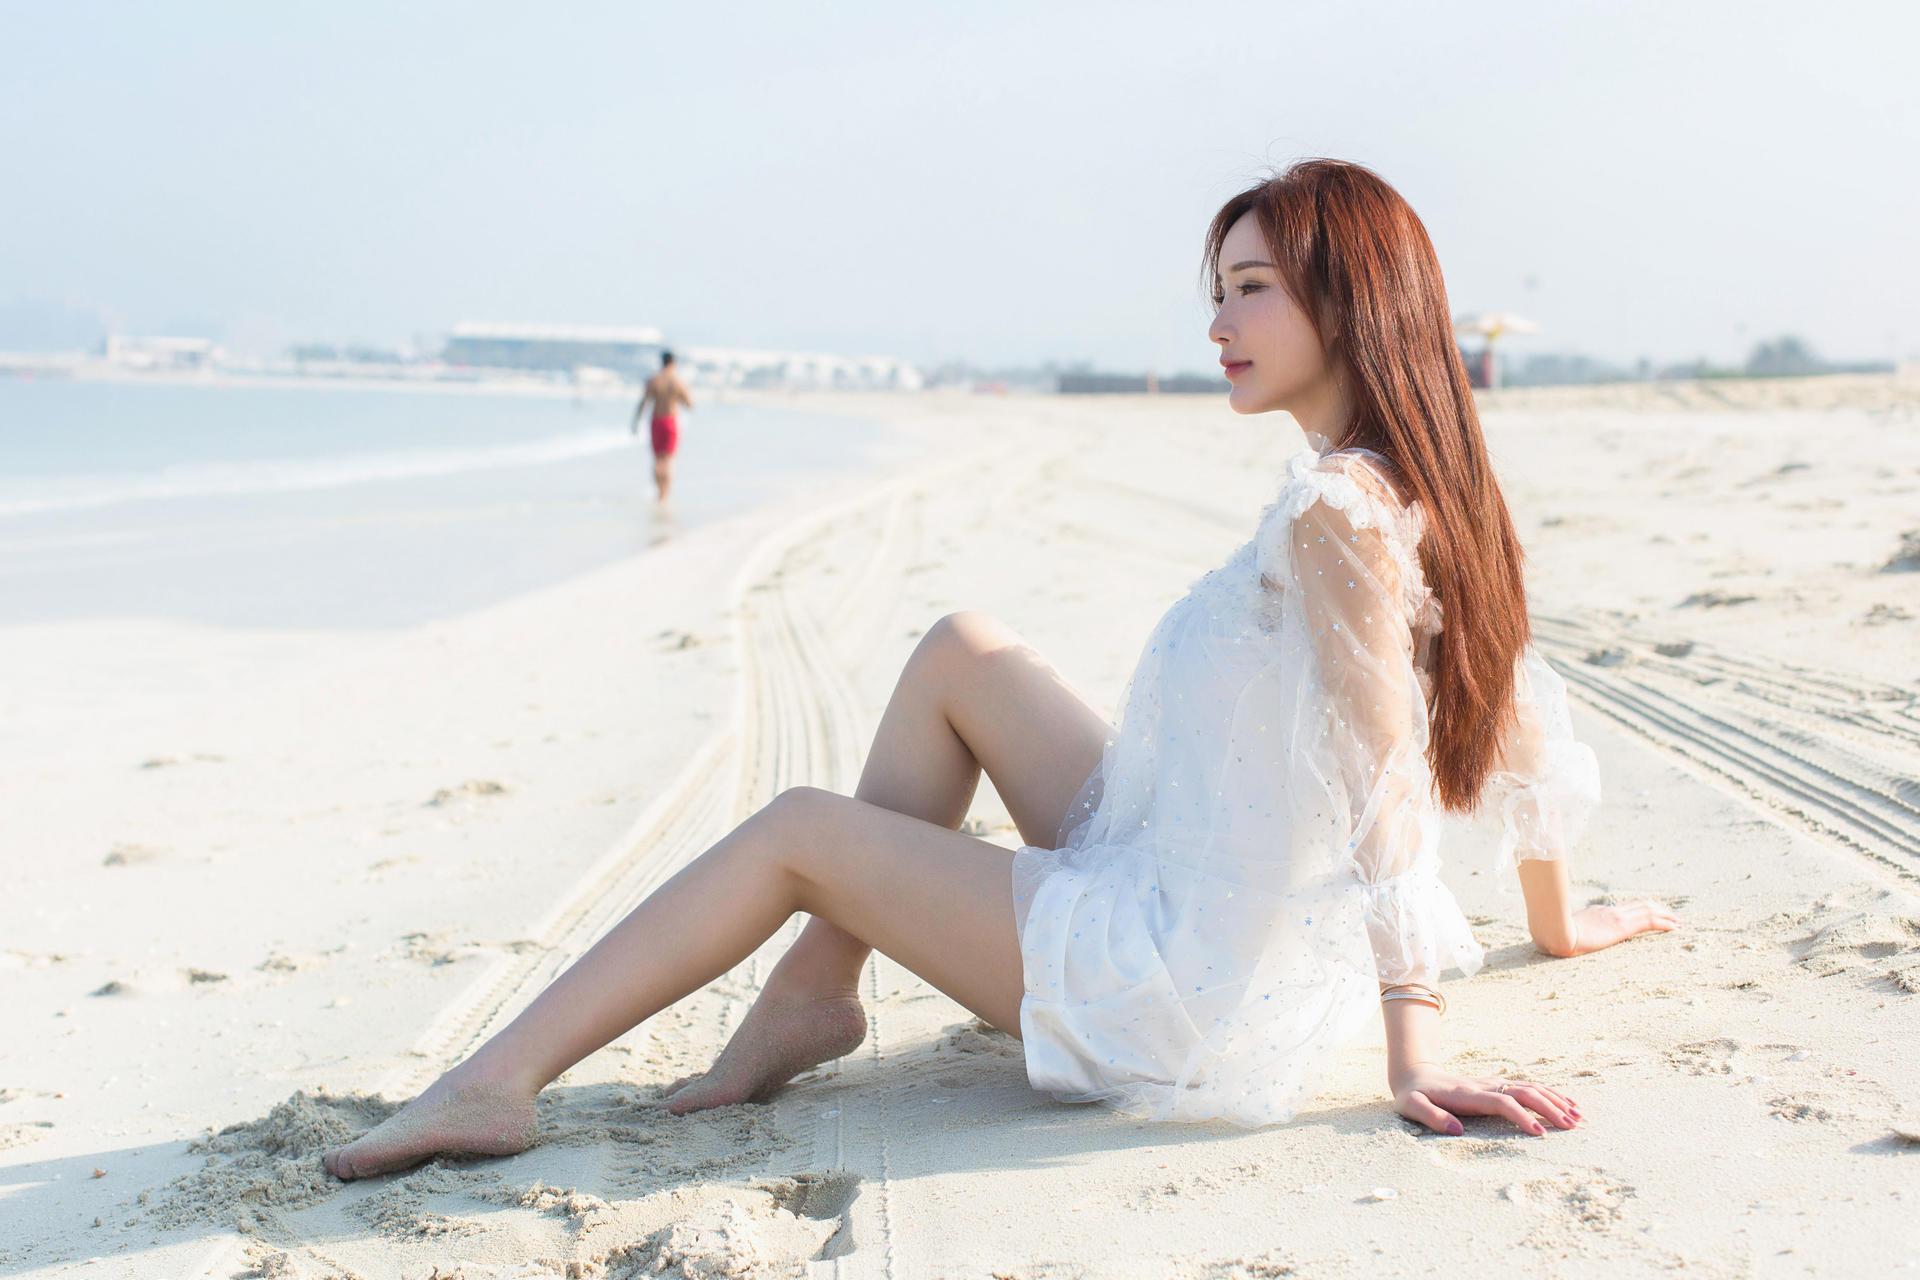 【v粉主题素材壁纸】沙滩白衣美女【8p】